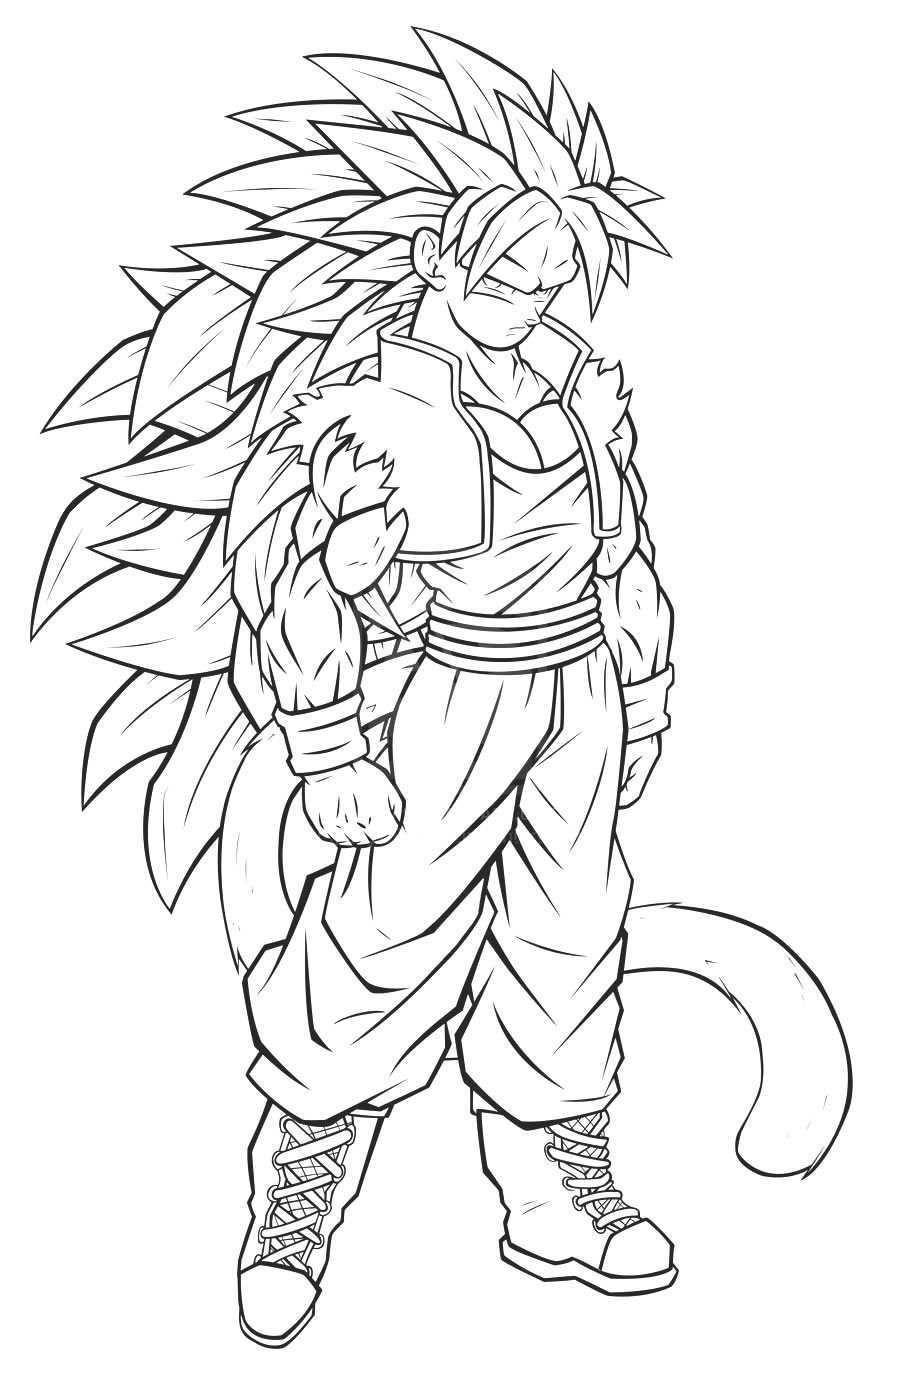 Goku Fase 4 | DBZ | Dragon ball, Goku super, Goku